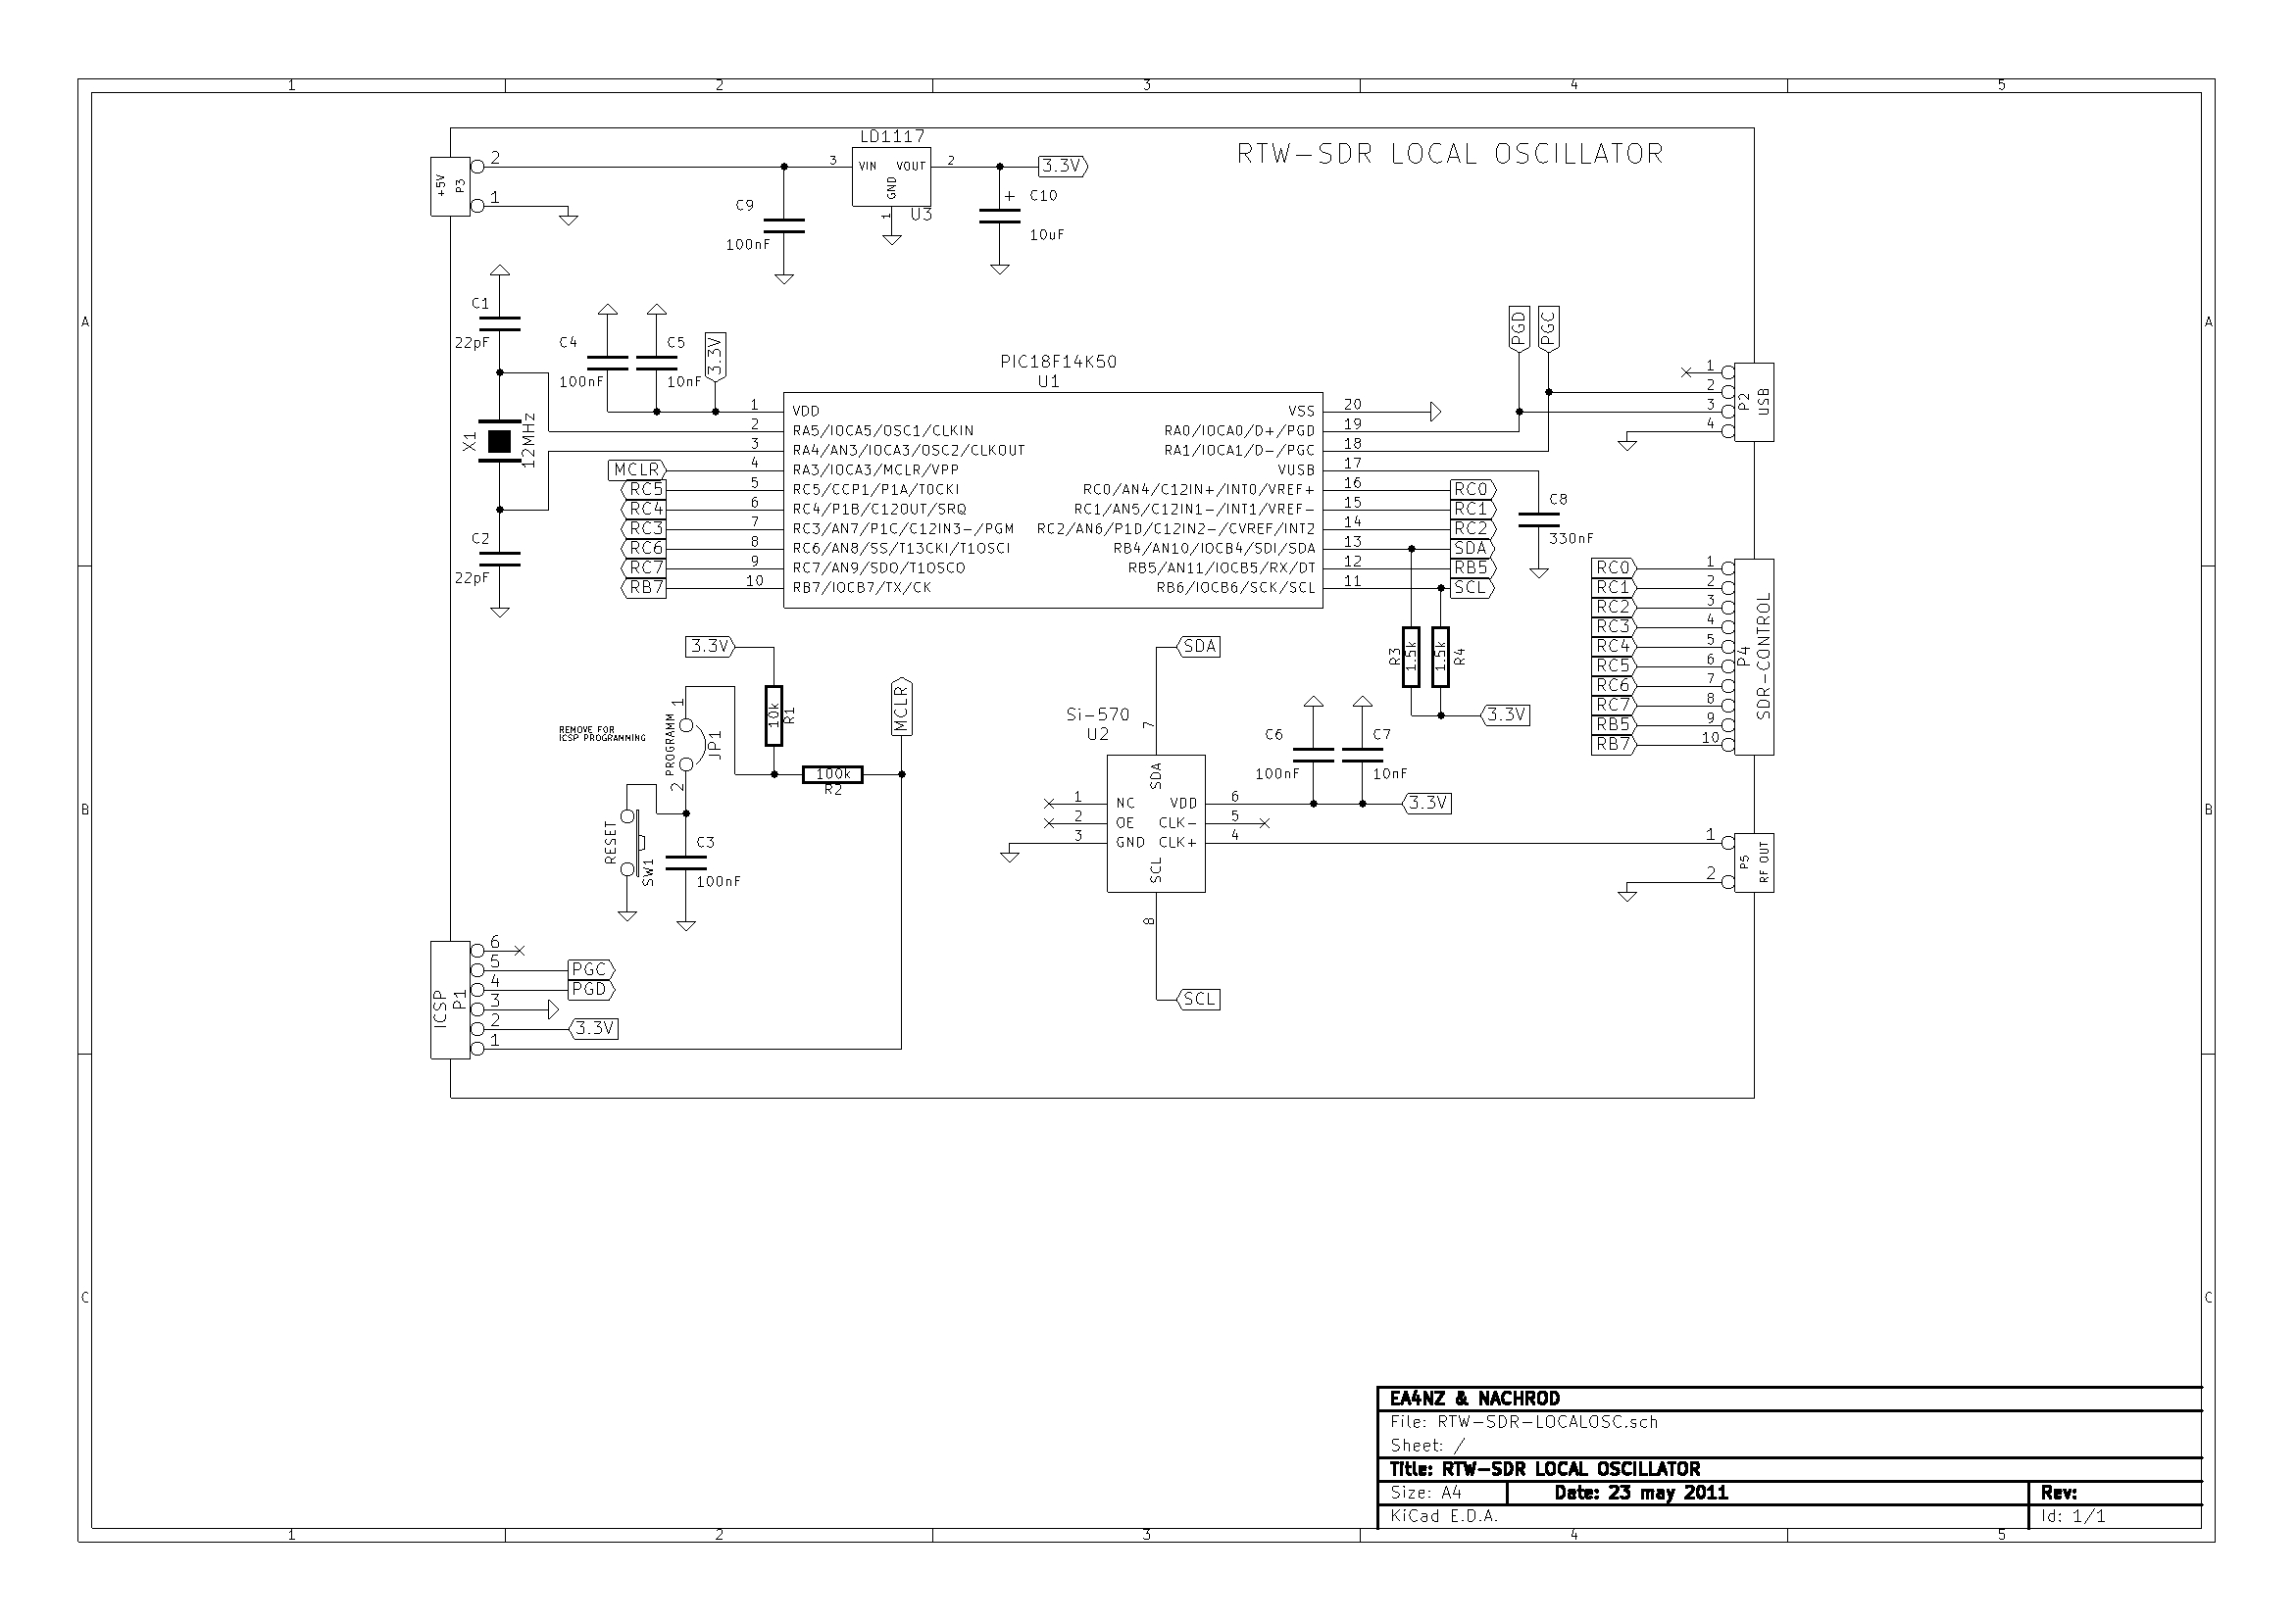 Sdr Hf Receiver Design Simple Mixer Schematics